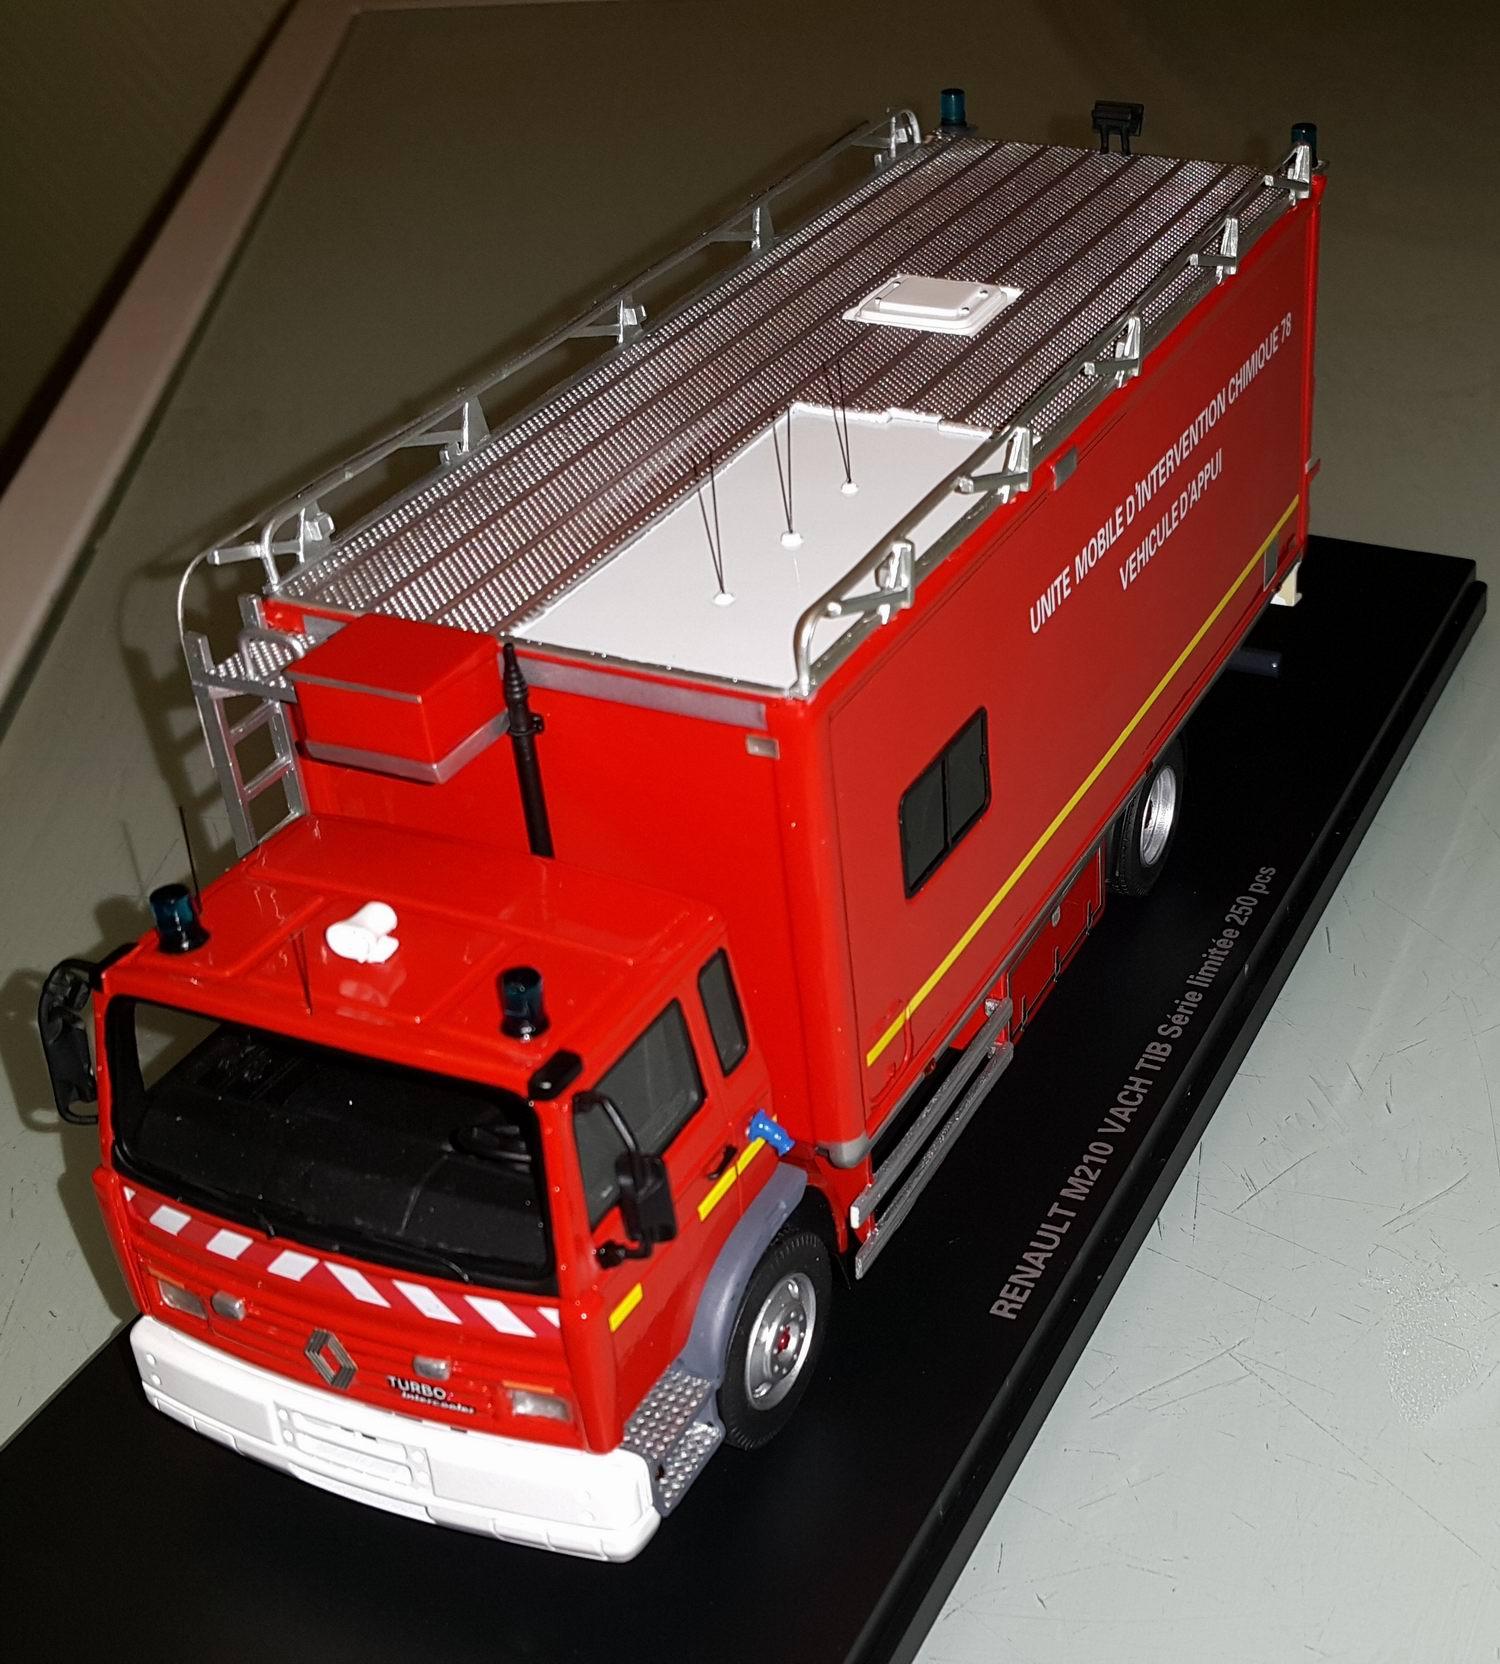 camion pompiers renault midlum m210 unite mobile intervention umi 1 43 alerte ebay. Black Bedroom Furniture Sets. Home Design Ideas